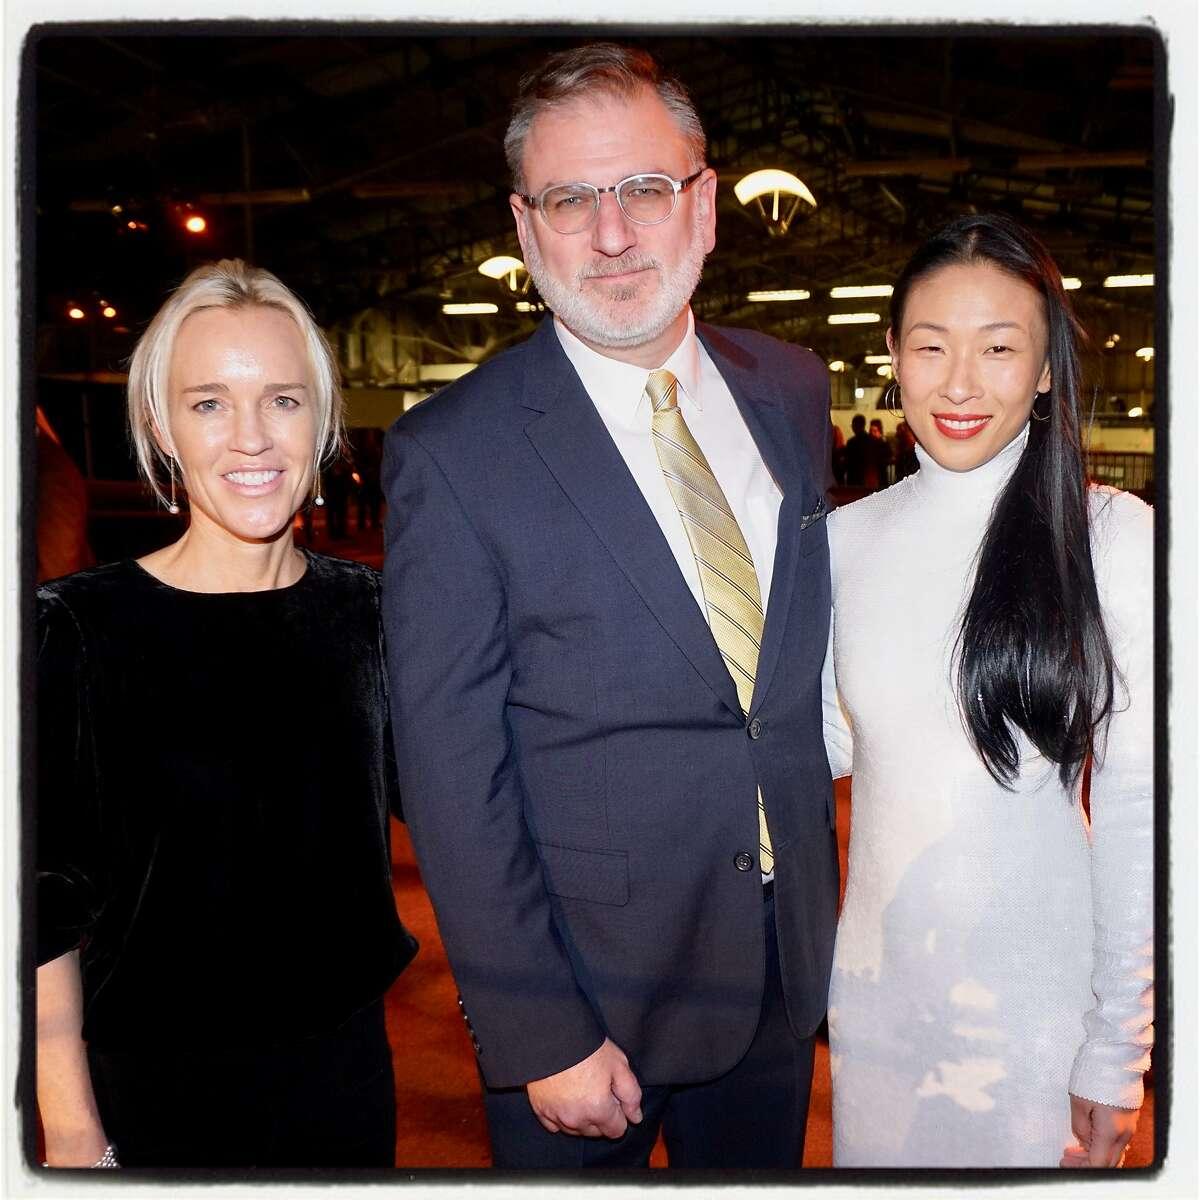 SFFilm executive director Noah Cowan with SFFilm Awards Night cochairs Heidi Fisher (left) and Sonya Yu. Dec. 3. 2018.